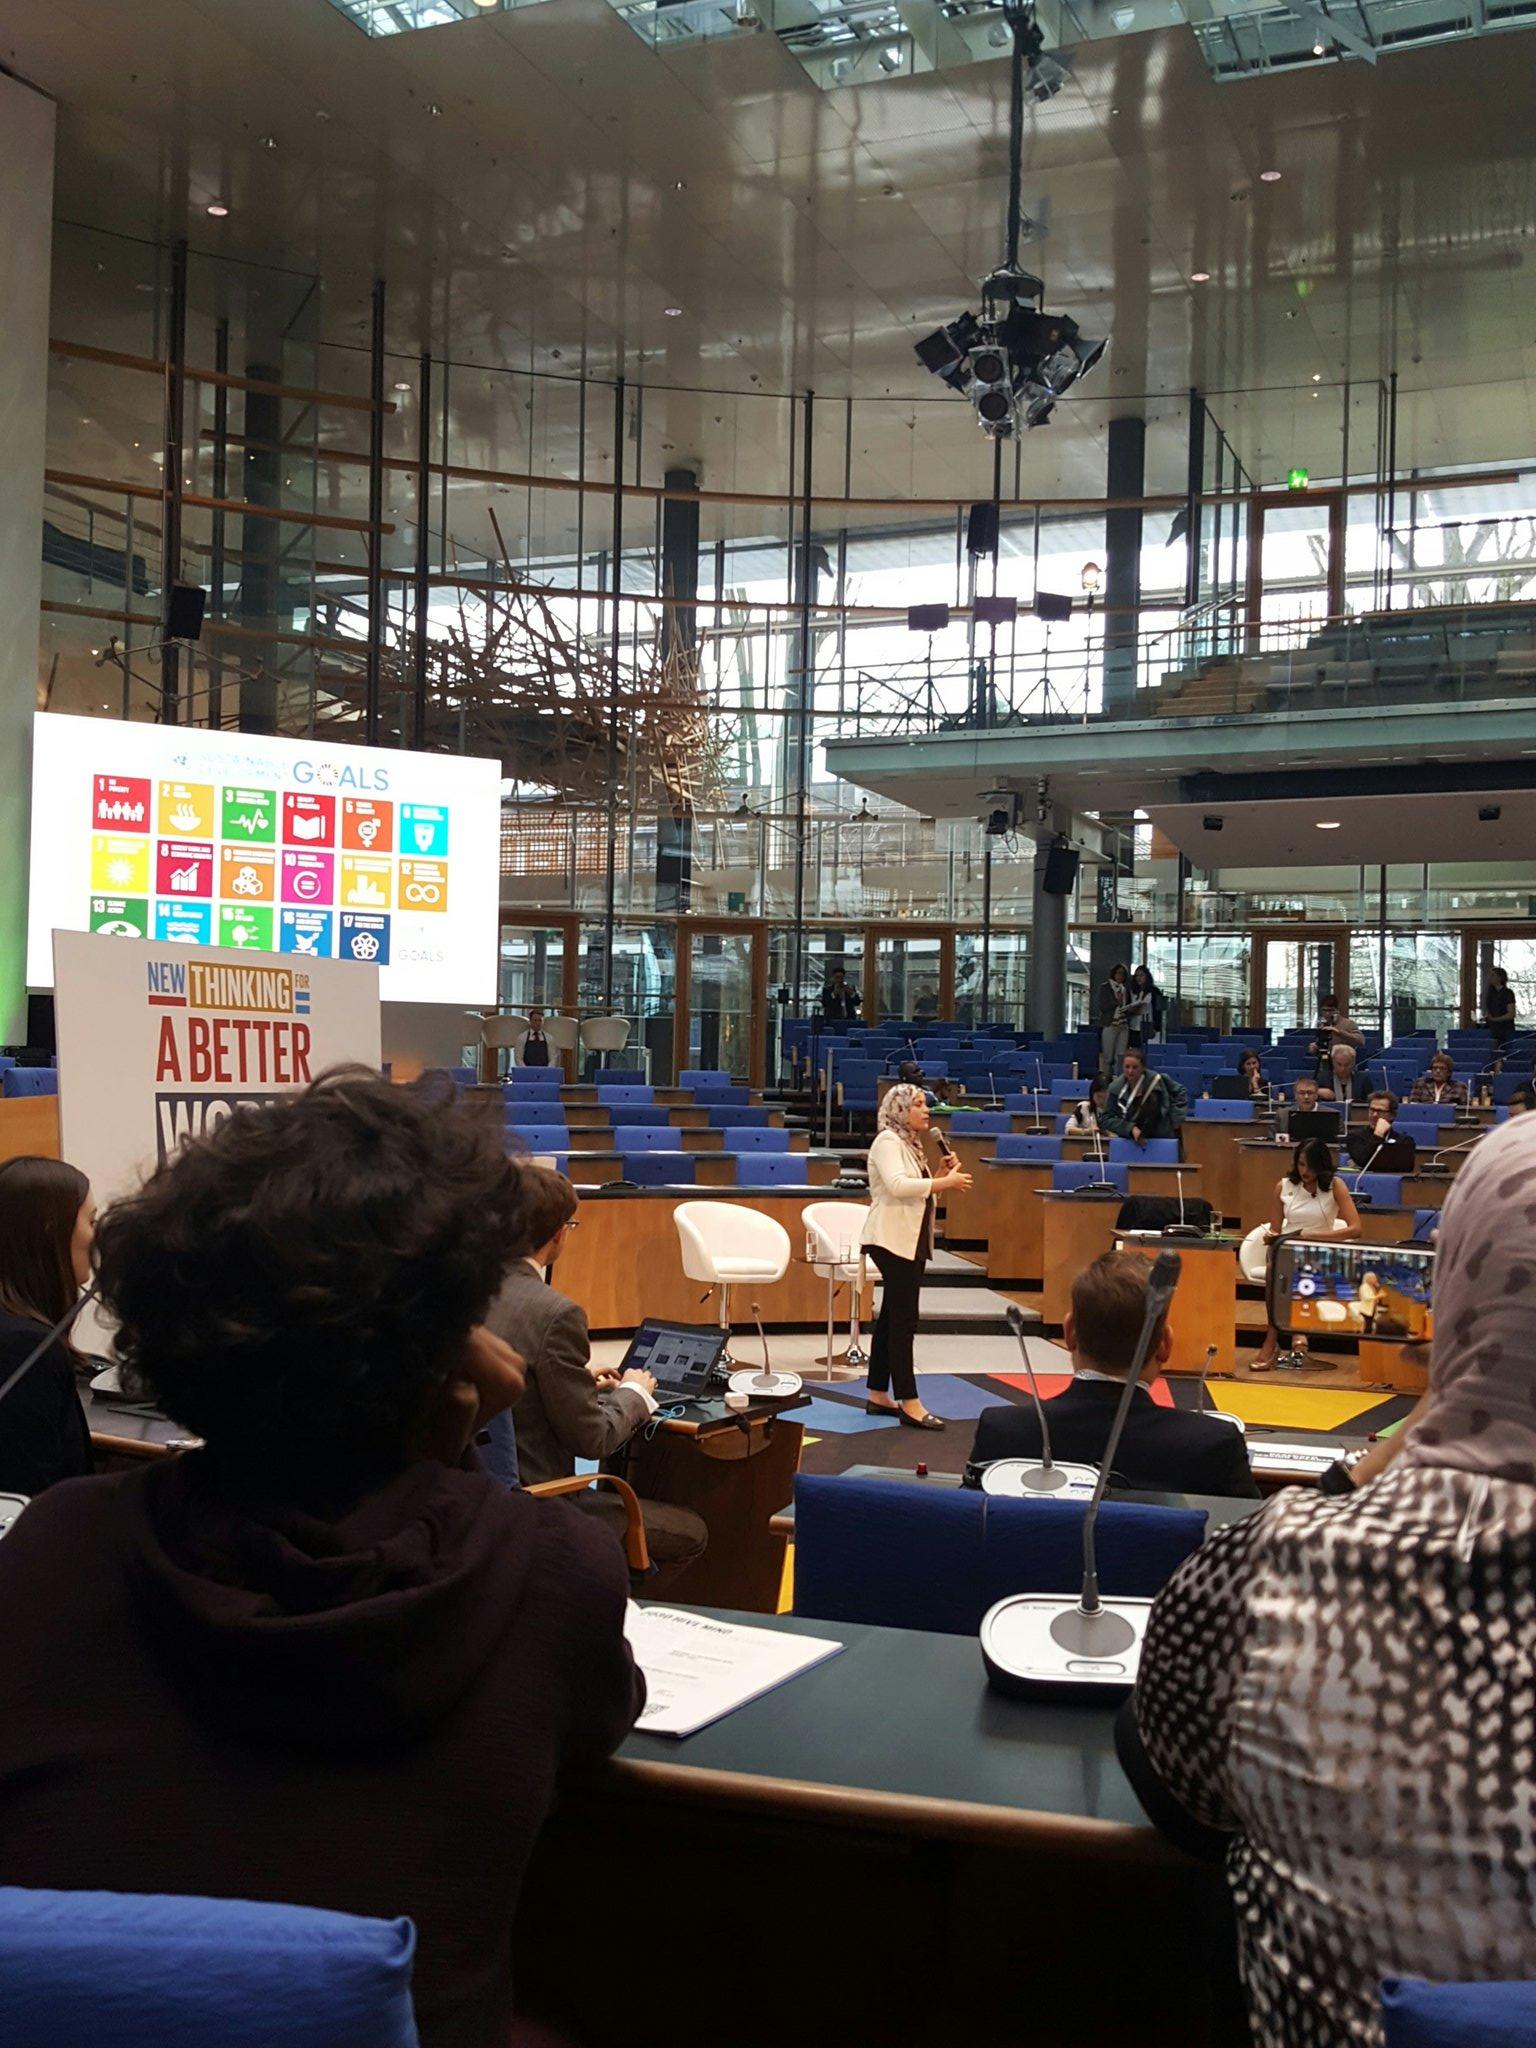 @almmura kicks off @GlobalFestIdeas discussing women's inclusion as an incredible catalyst across SDGS #GFI4SD #womensrightsarehumanrights https://t.co/V4Svfz6N3L